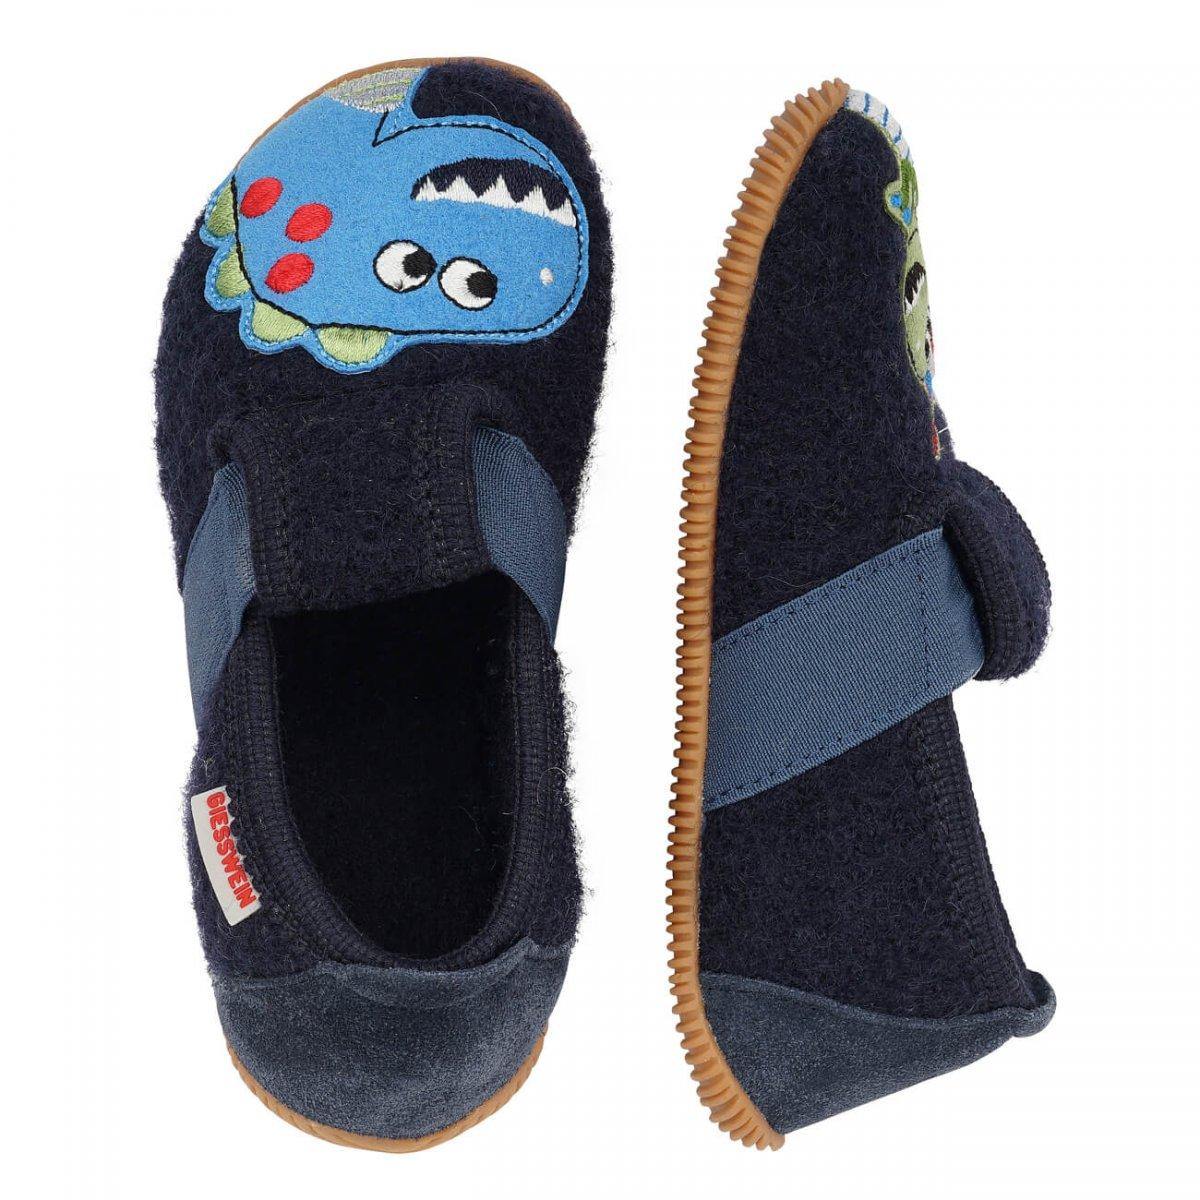 Dinosaur Boy Slippers